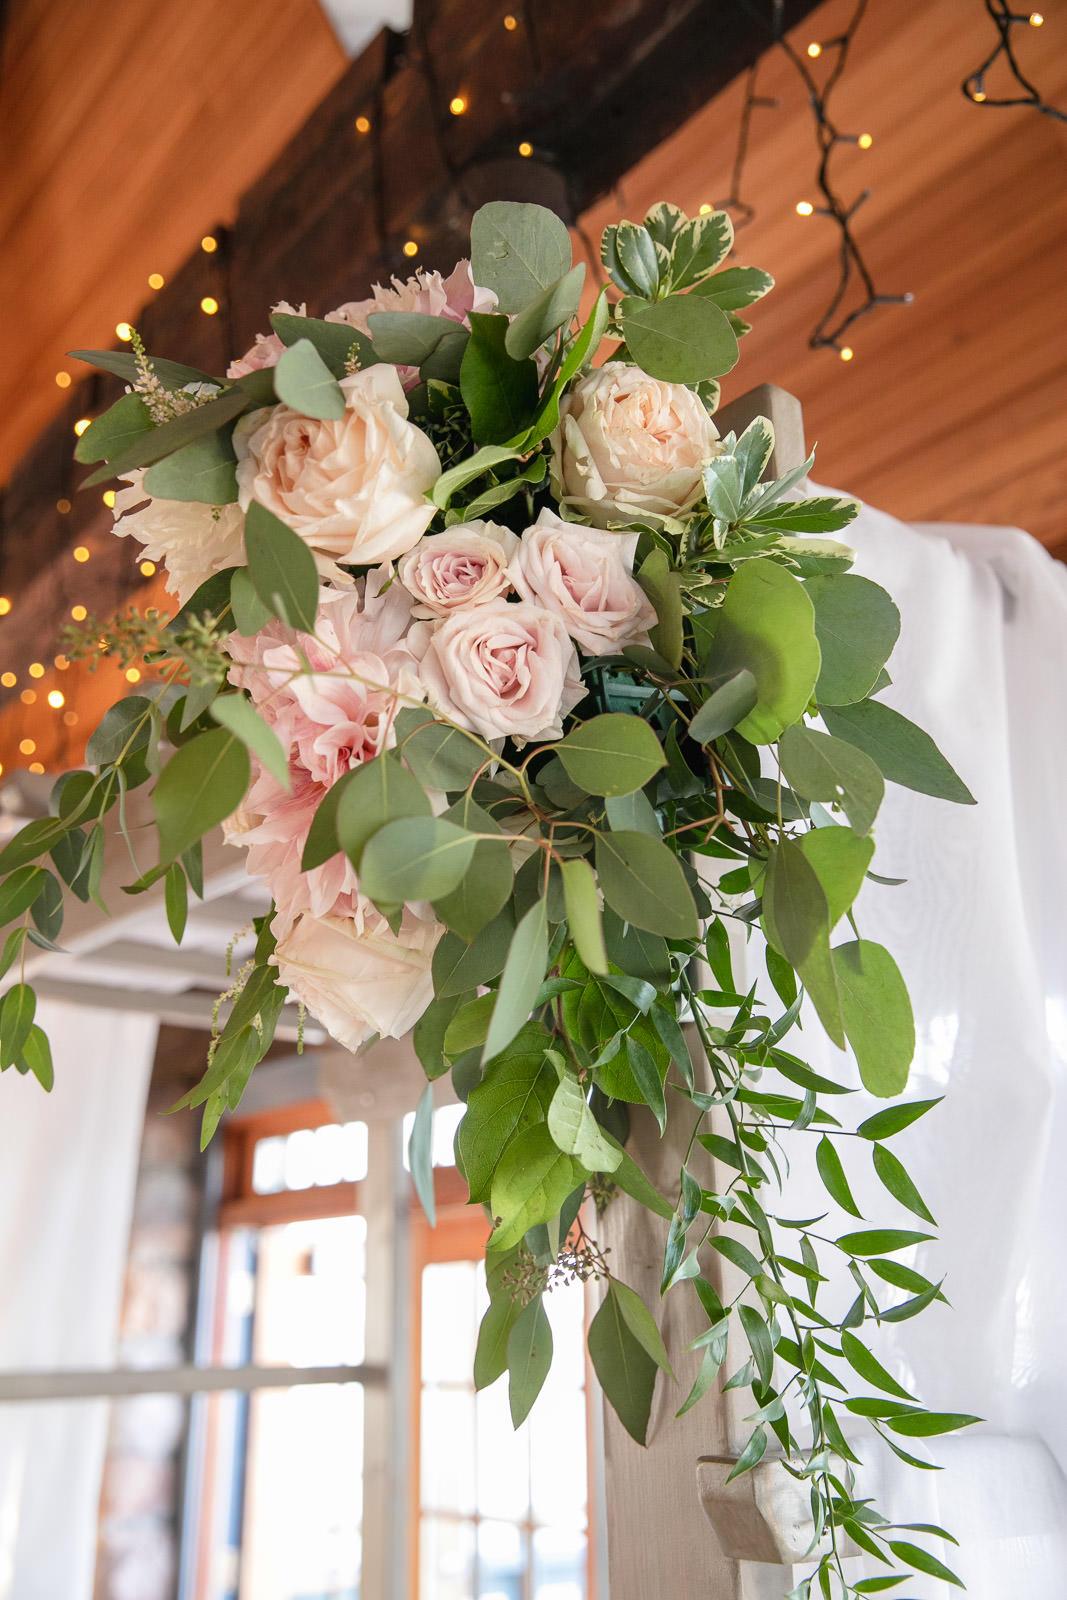 Wedding, Narragansett Towers, The Towers, Narragansett, Rhode Island, RI, Tracy Jenkins photography, RI wedding photographer, Rhode Island wedding photographer, wedding details, flowers, arbor decorations